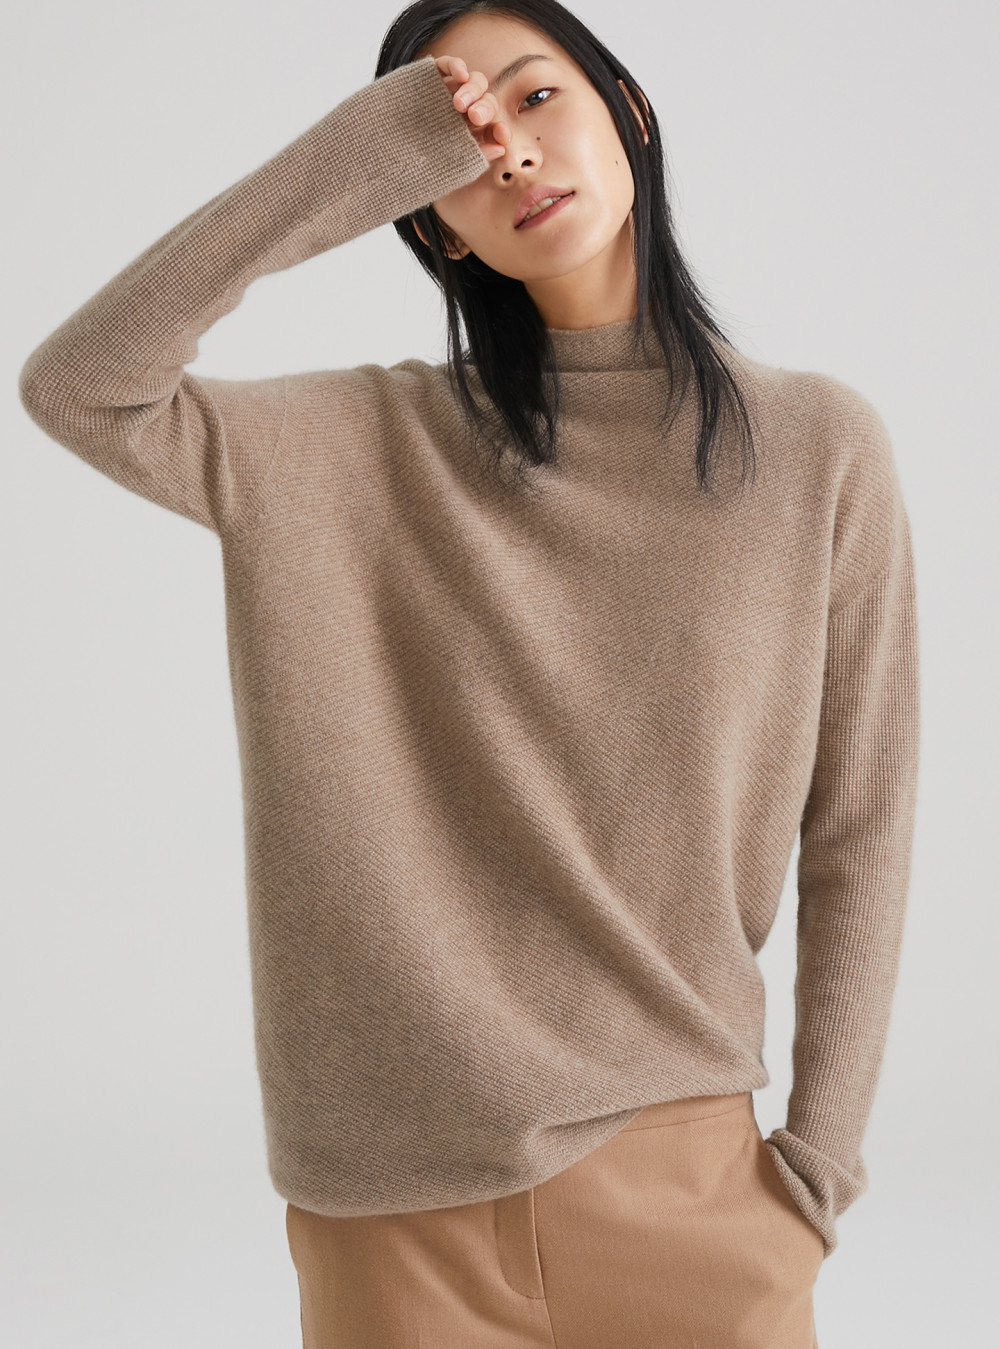 Icicle Women Styles Push Seamless Knitwear